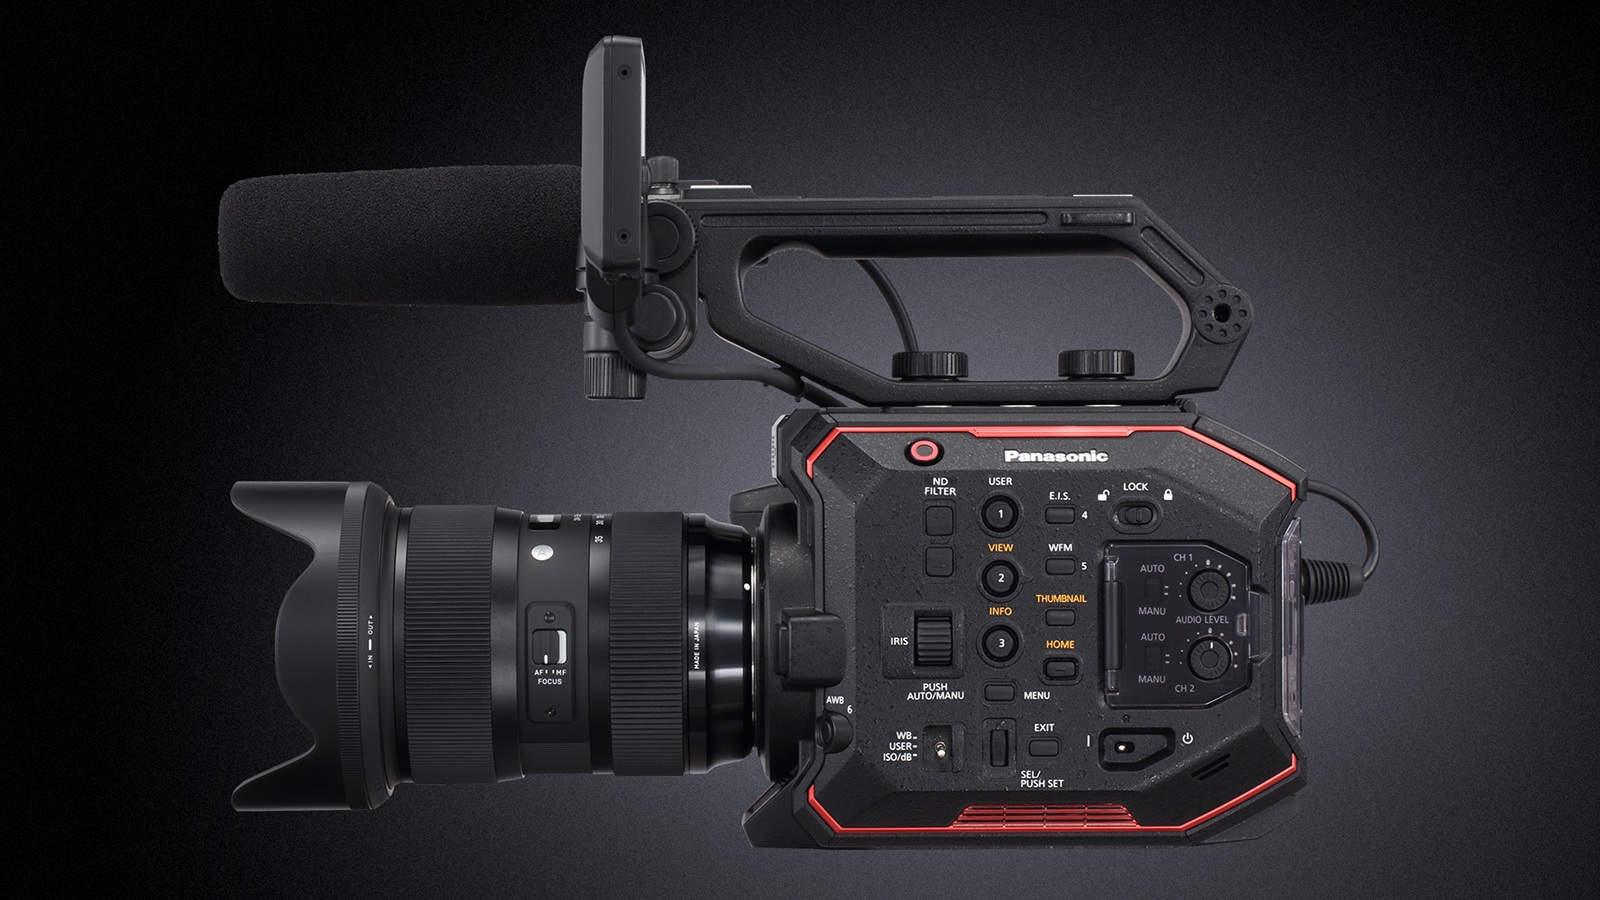 panasonic-eva1-cinema-camera